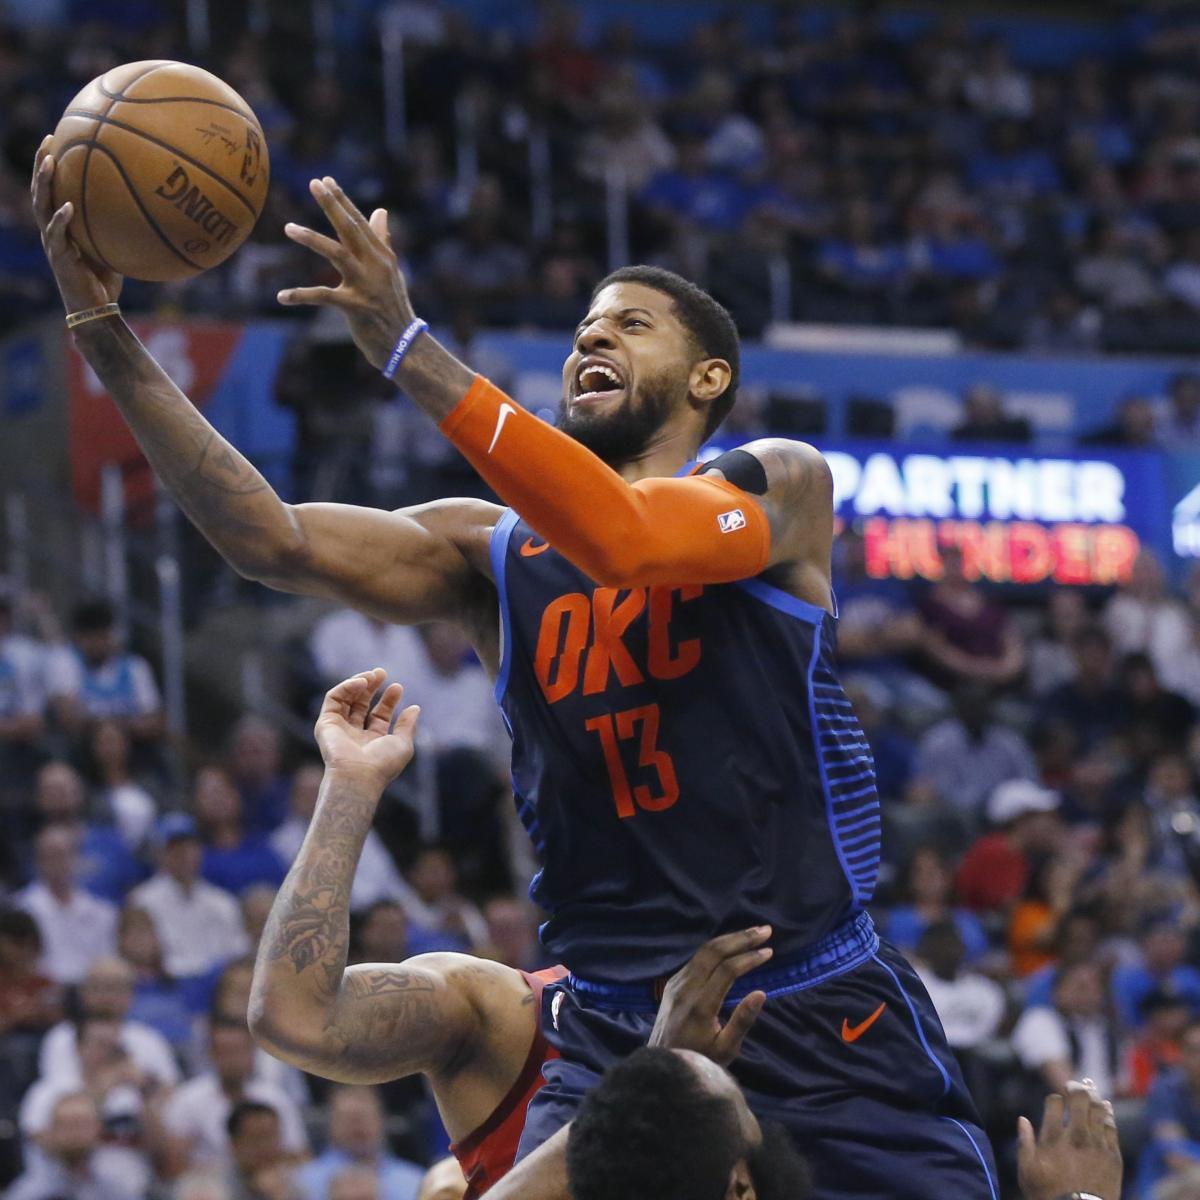 NBA Playoffs 2019: Known Schedule, Bracket Picture Before